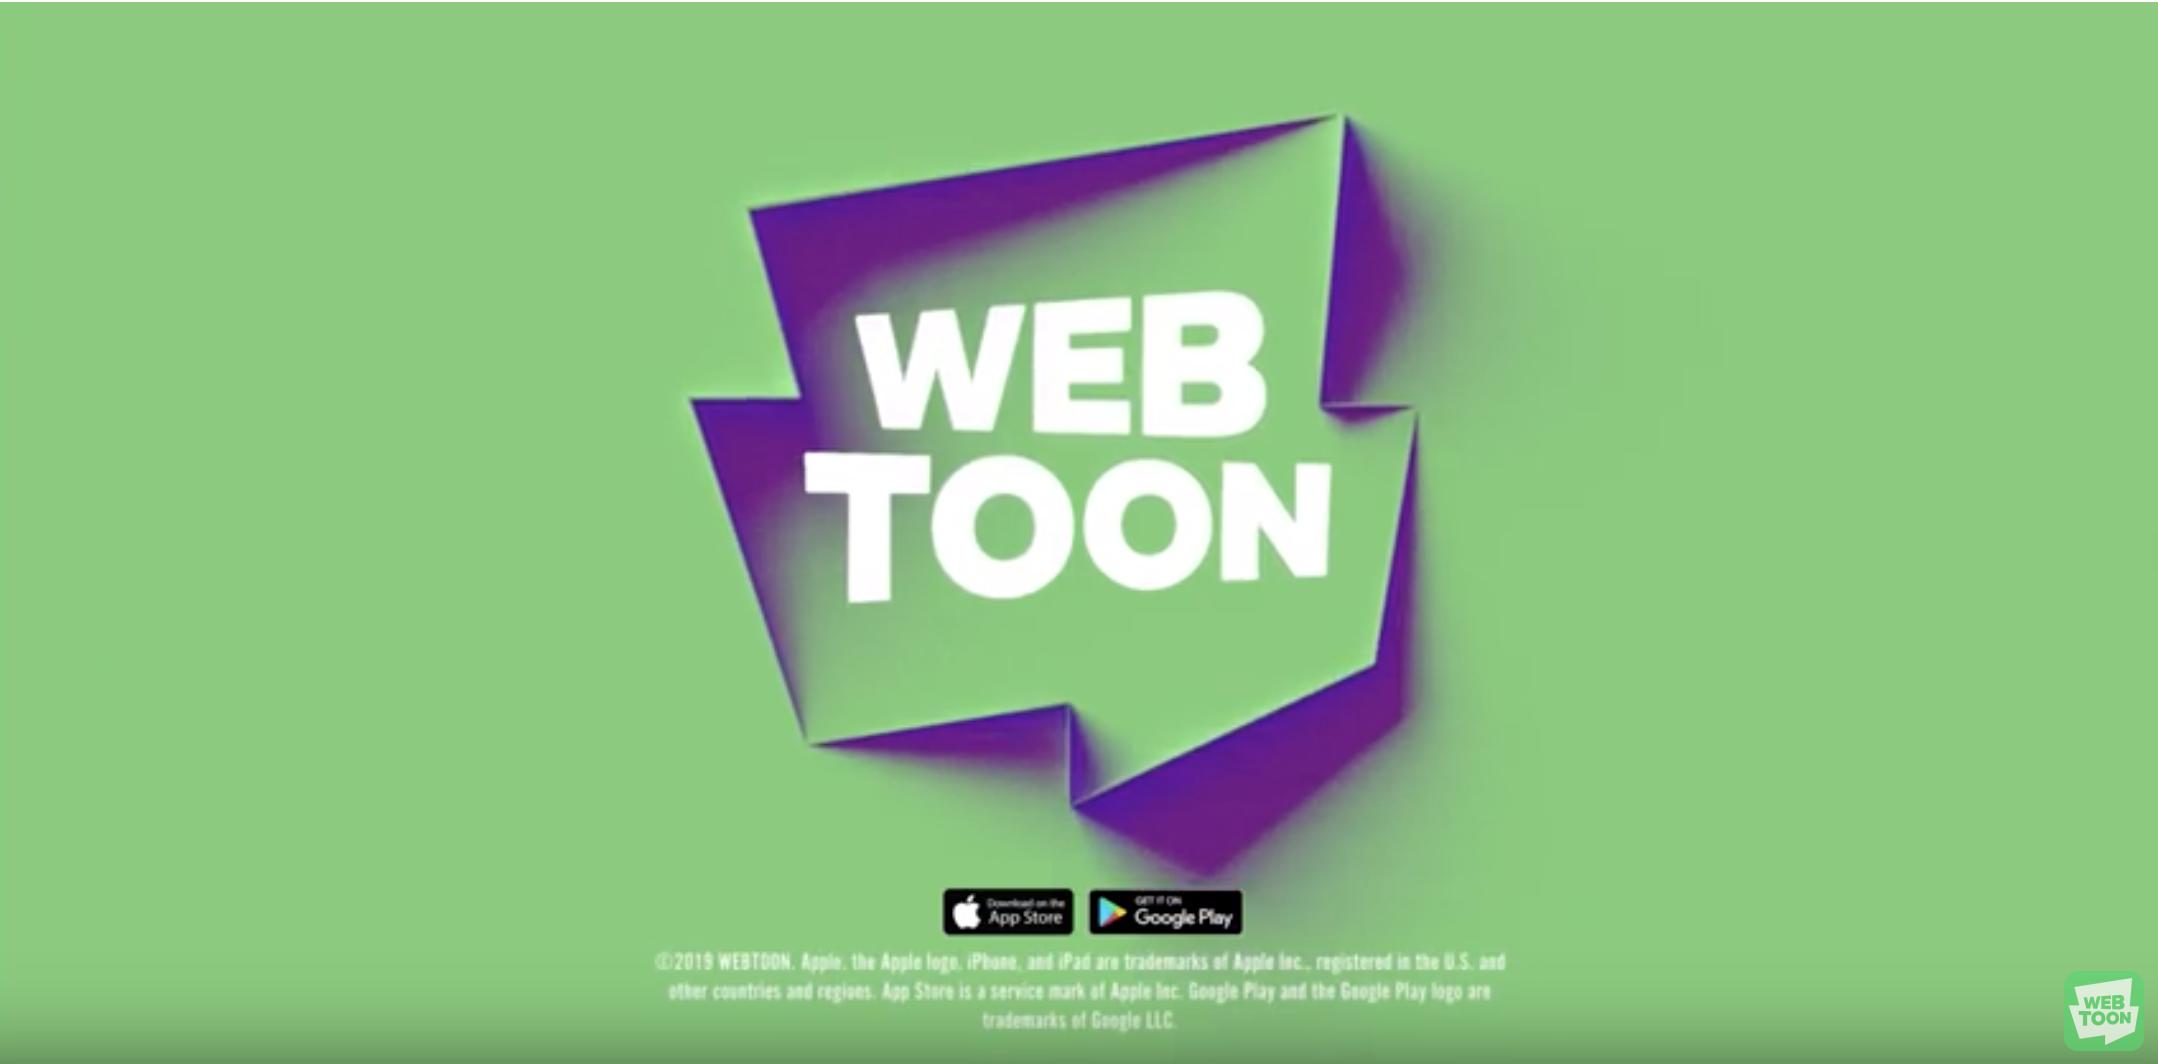 WEBTOON Celebrates Their 5th Anniversary with 100 Billion Views!